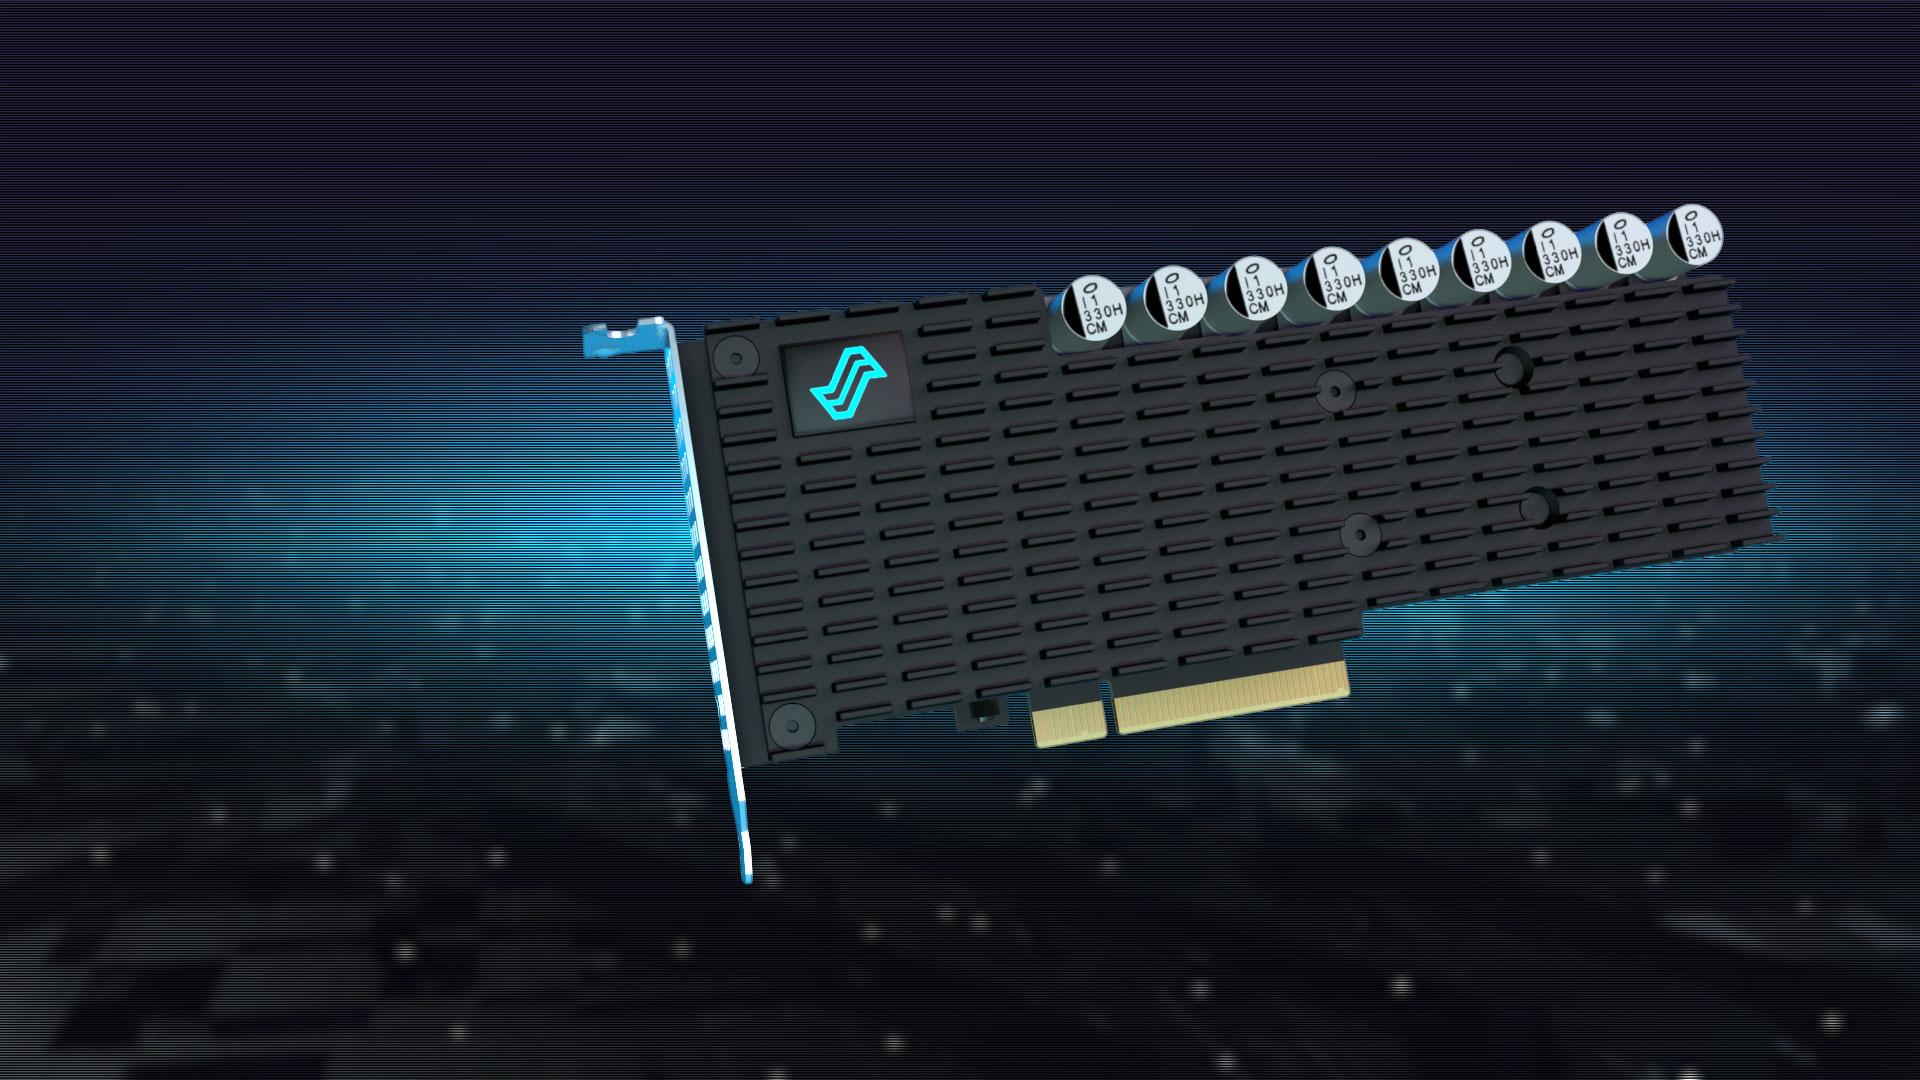 Element LQD3000 AIC SSD